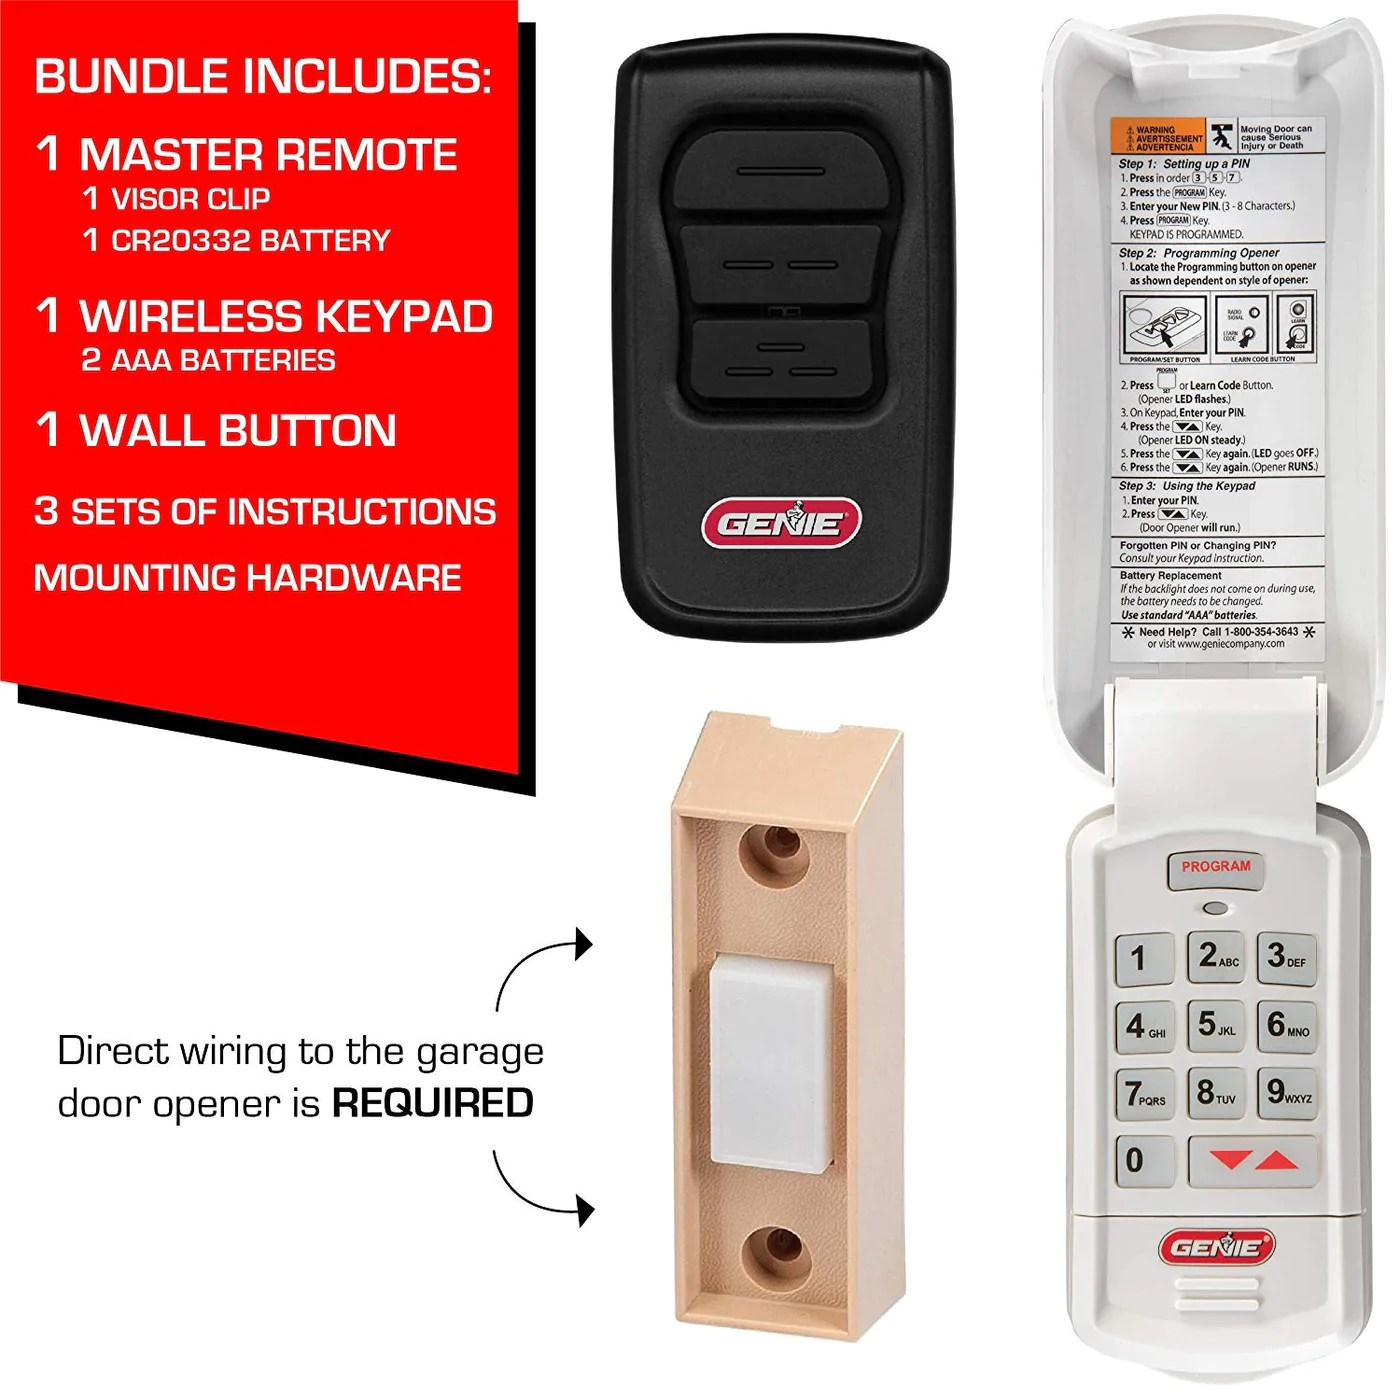 genies accessories bundle for garage door openers come with diy detailed illustrated programming instructions genie s  [ 1400 x 1400 Pixel ]